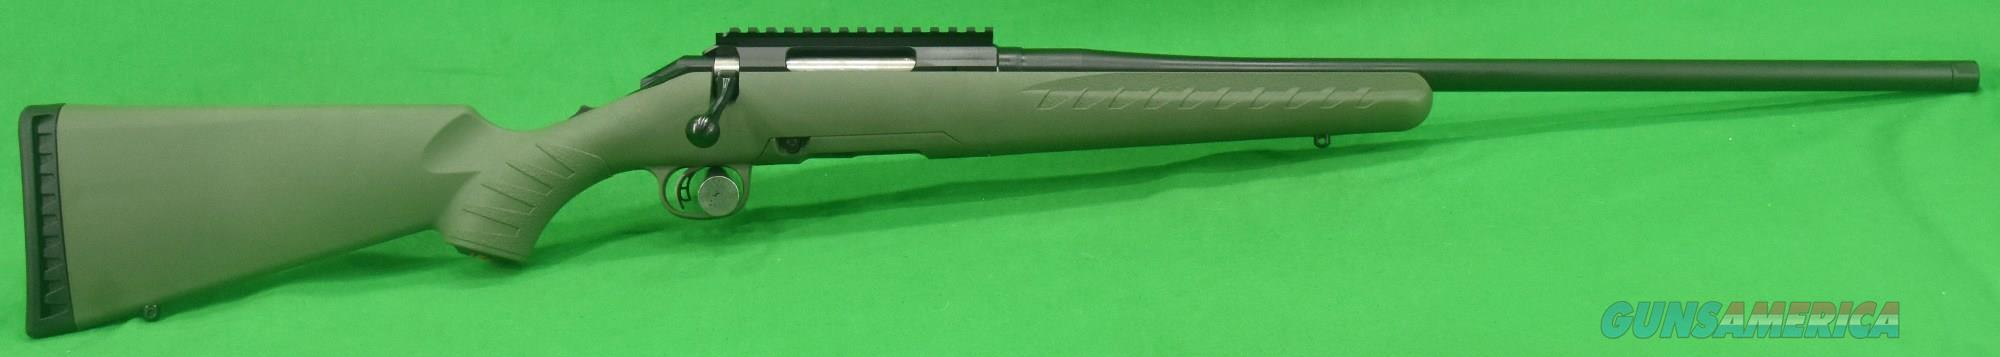 American Predator Green 223Rem 22In   26944  Guns > Rifles > Ruger Rifles > American Rifle